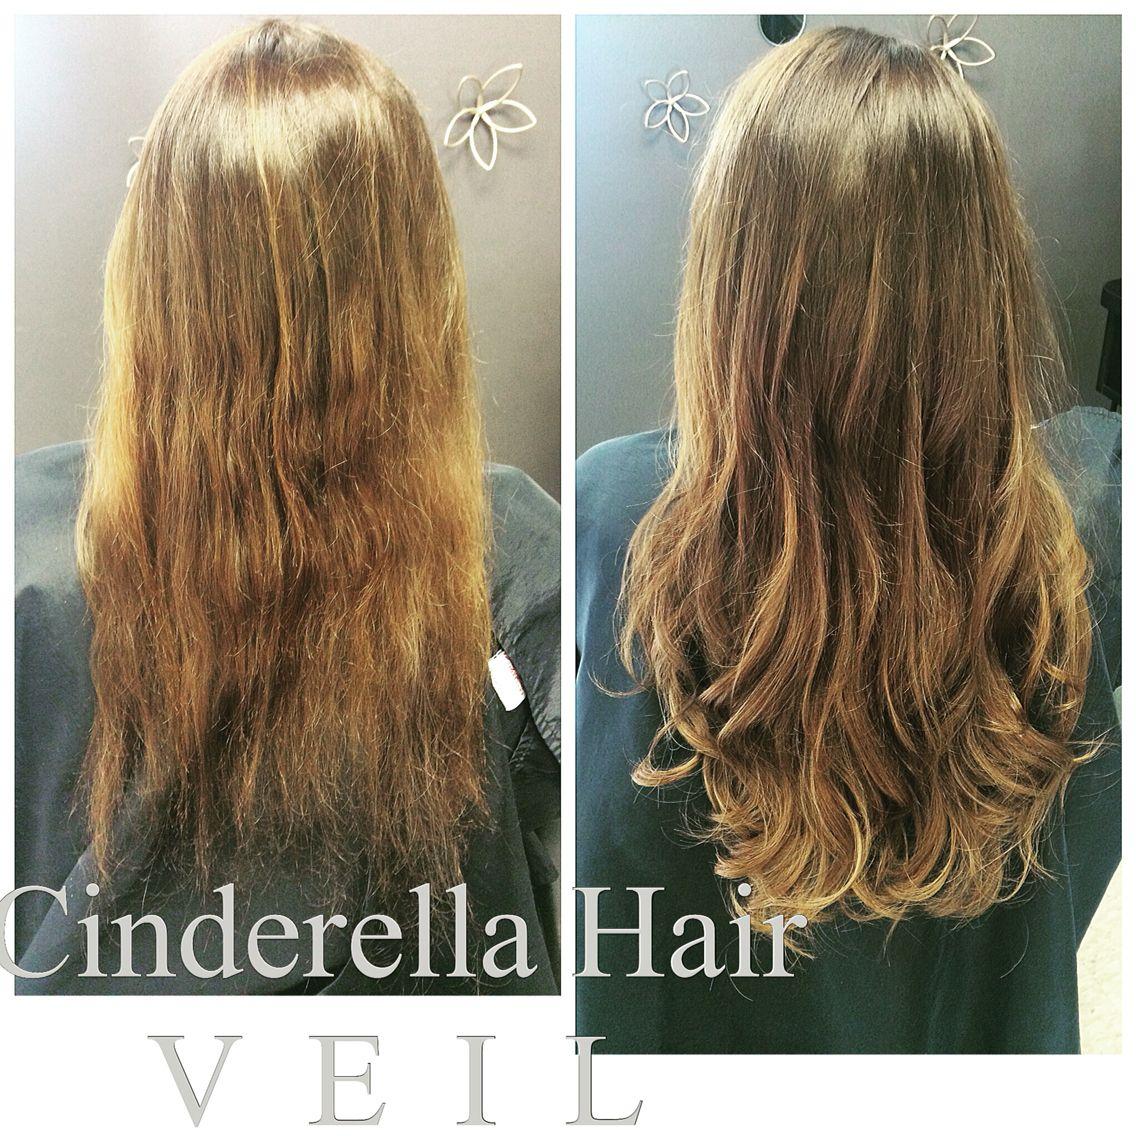 Cinderella hair v e i l cinderella hair extensions pinterest cinderella hair v e i l pmusecretfo Choice Image